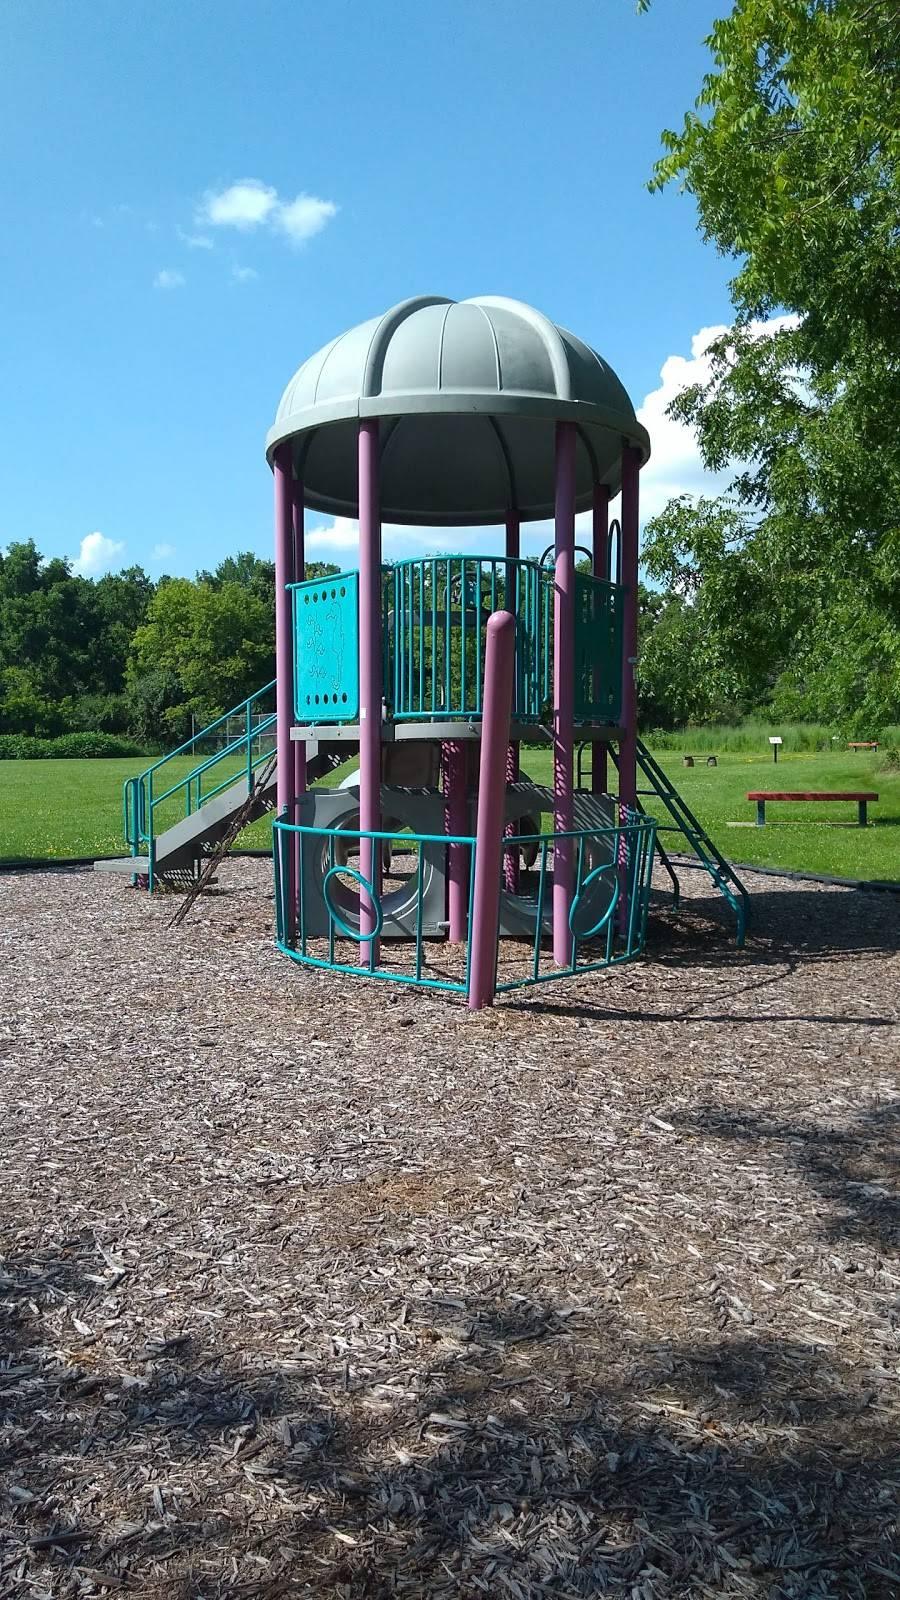 Carpenter - Ridgeway Park - park    Photo 3 of 9   Address: 1220 Carpenter St, Madison, WI 53704, USA   Phone: (608) 266-4711